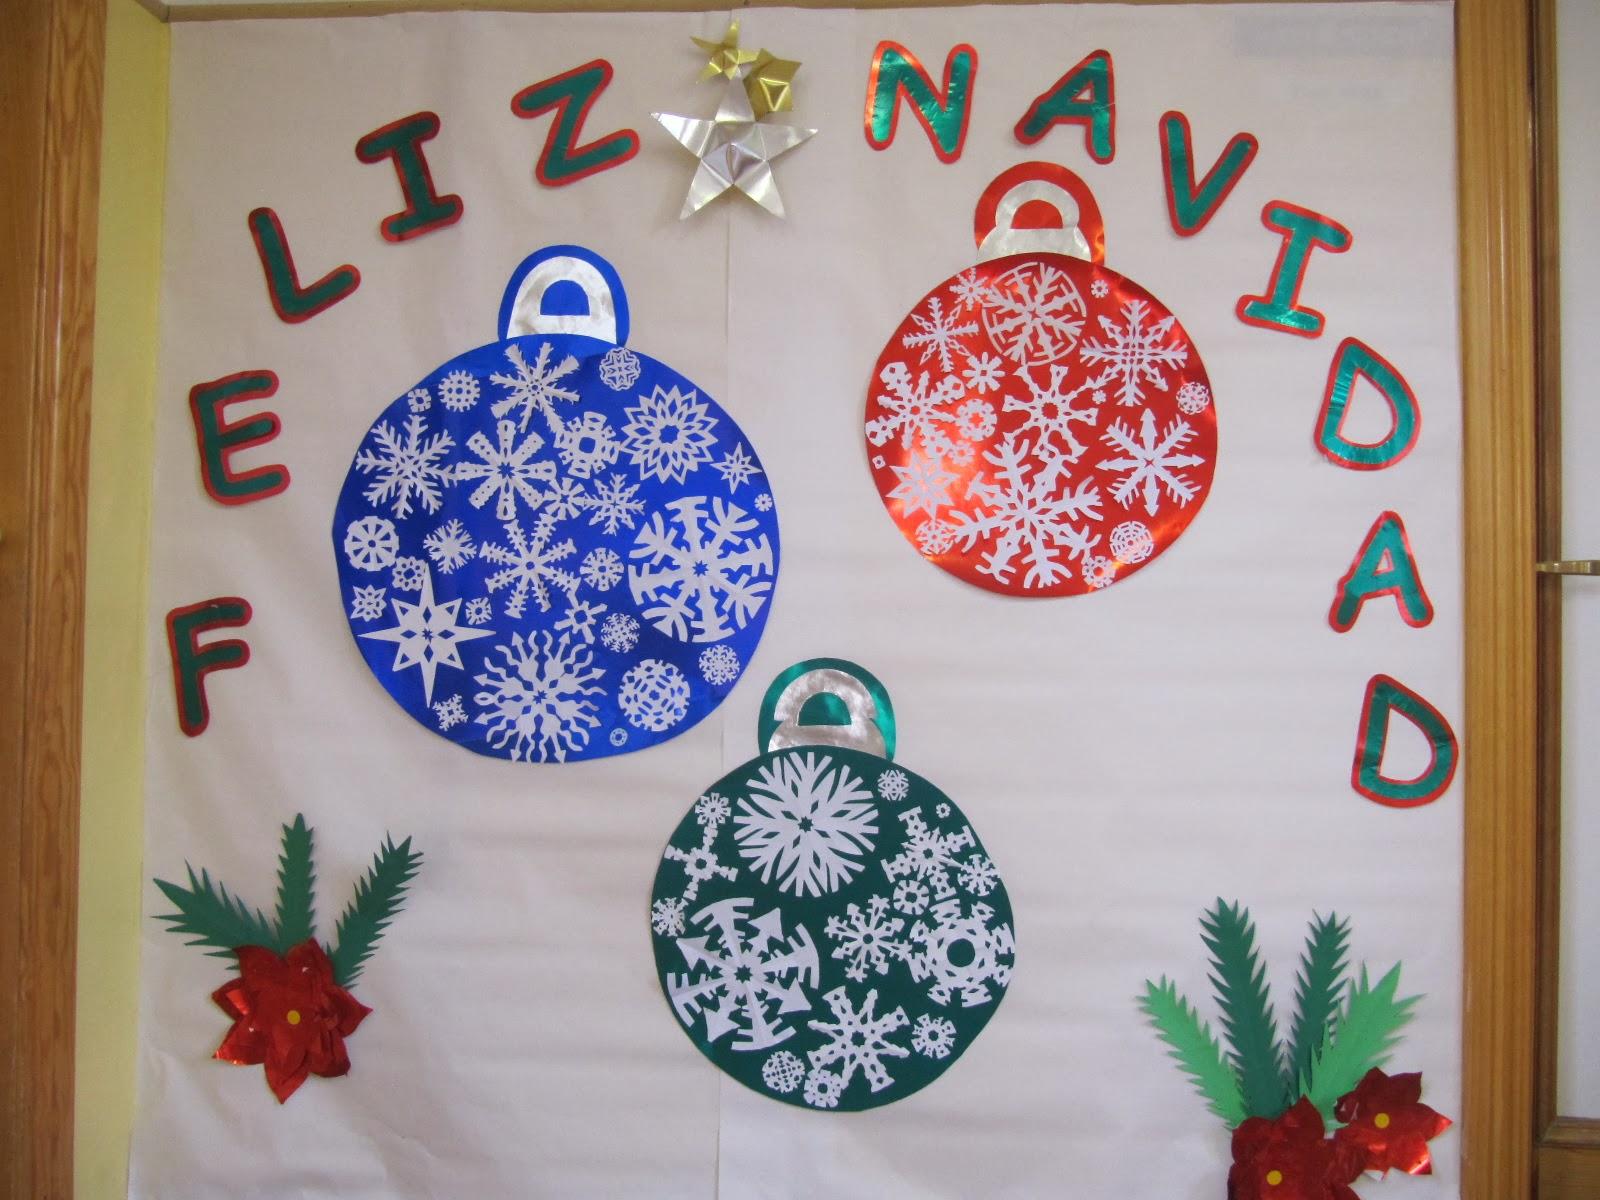 Cosicas y m s diciembre 2013 for Mural navideno